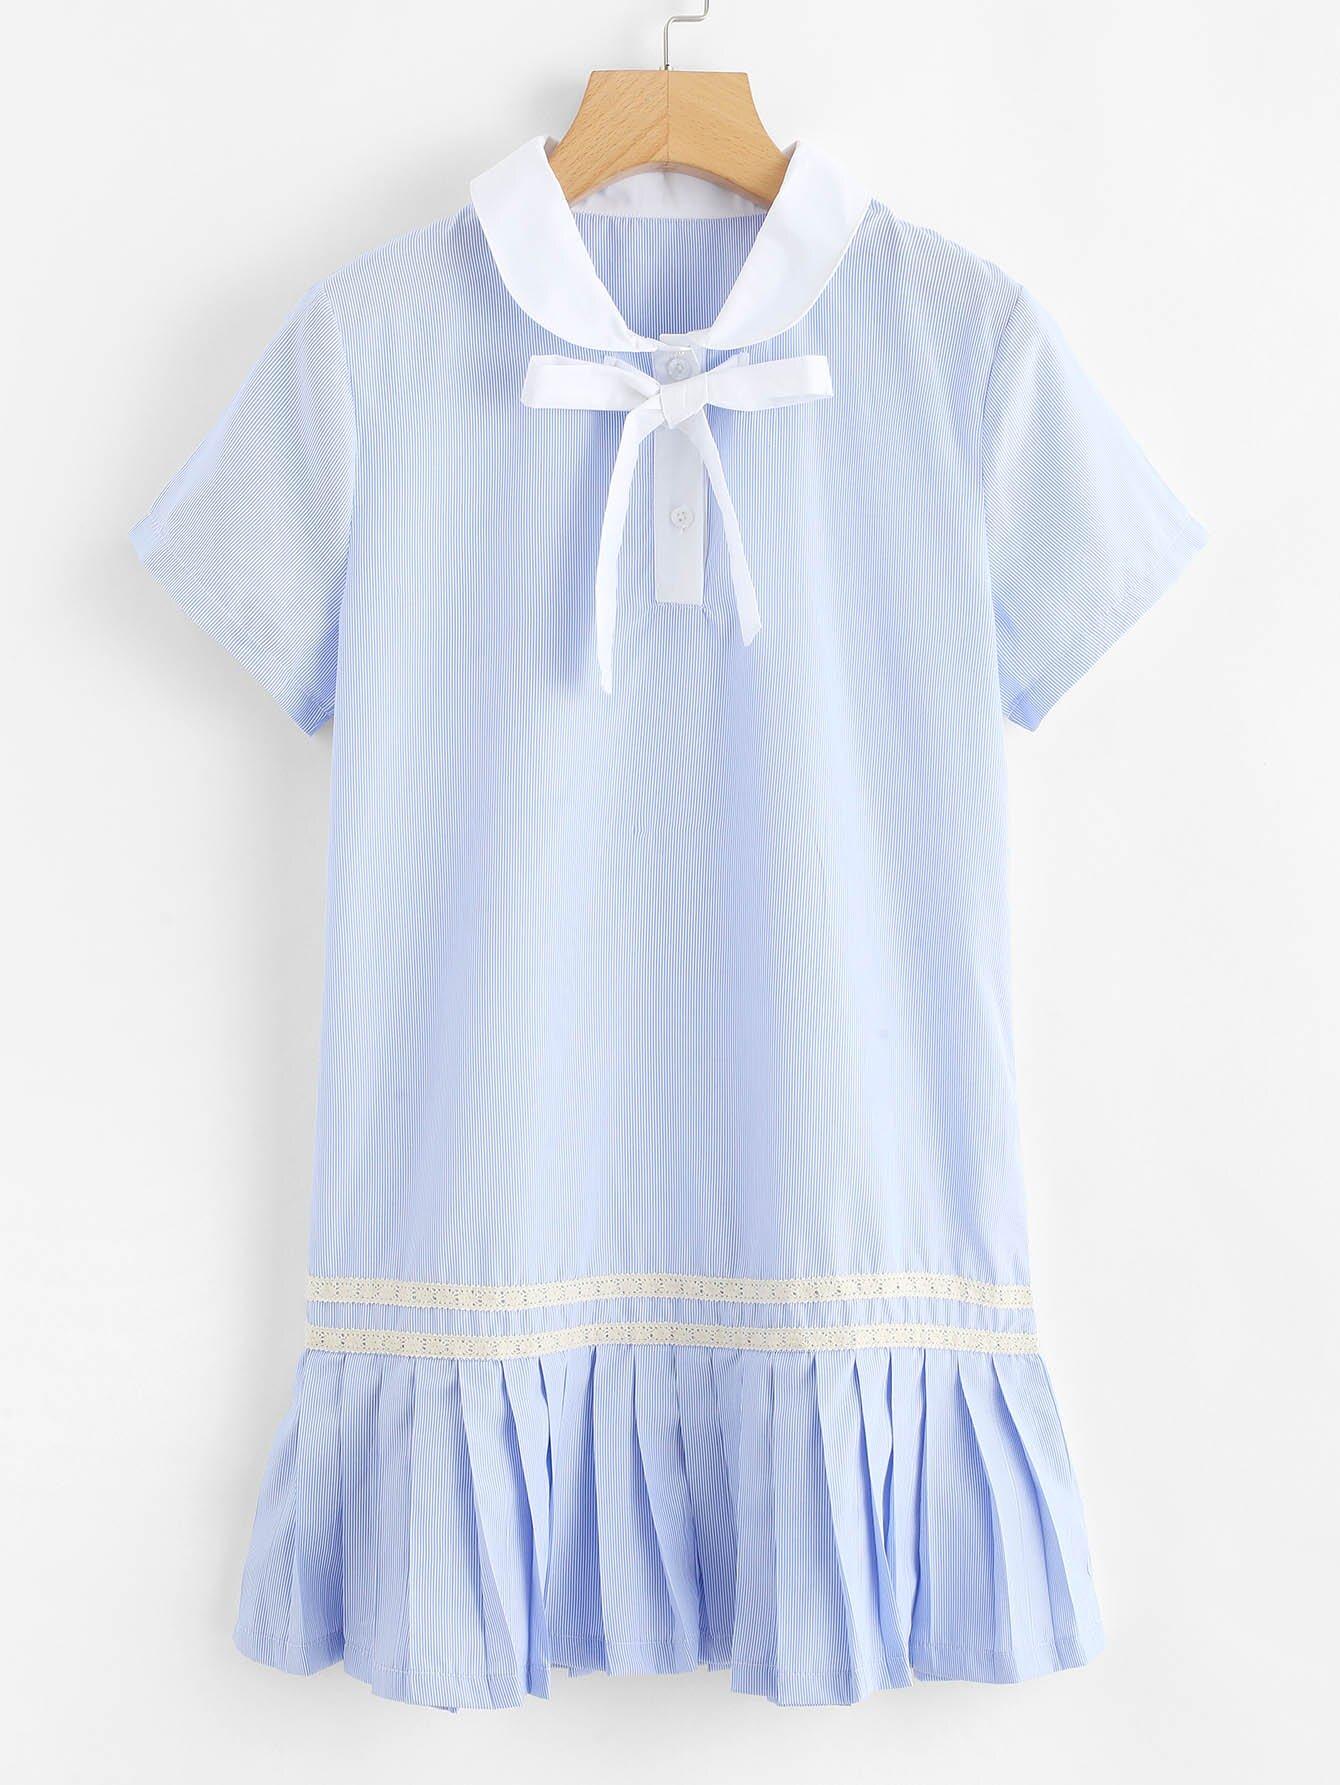 Lace Insert Tied Neck Flounce Hem Dress lace insert tassel tied floral dress